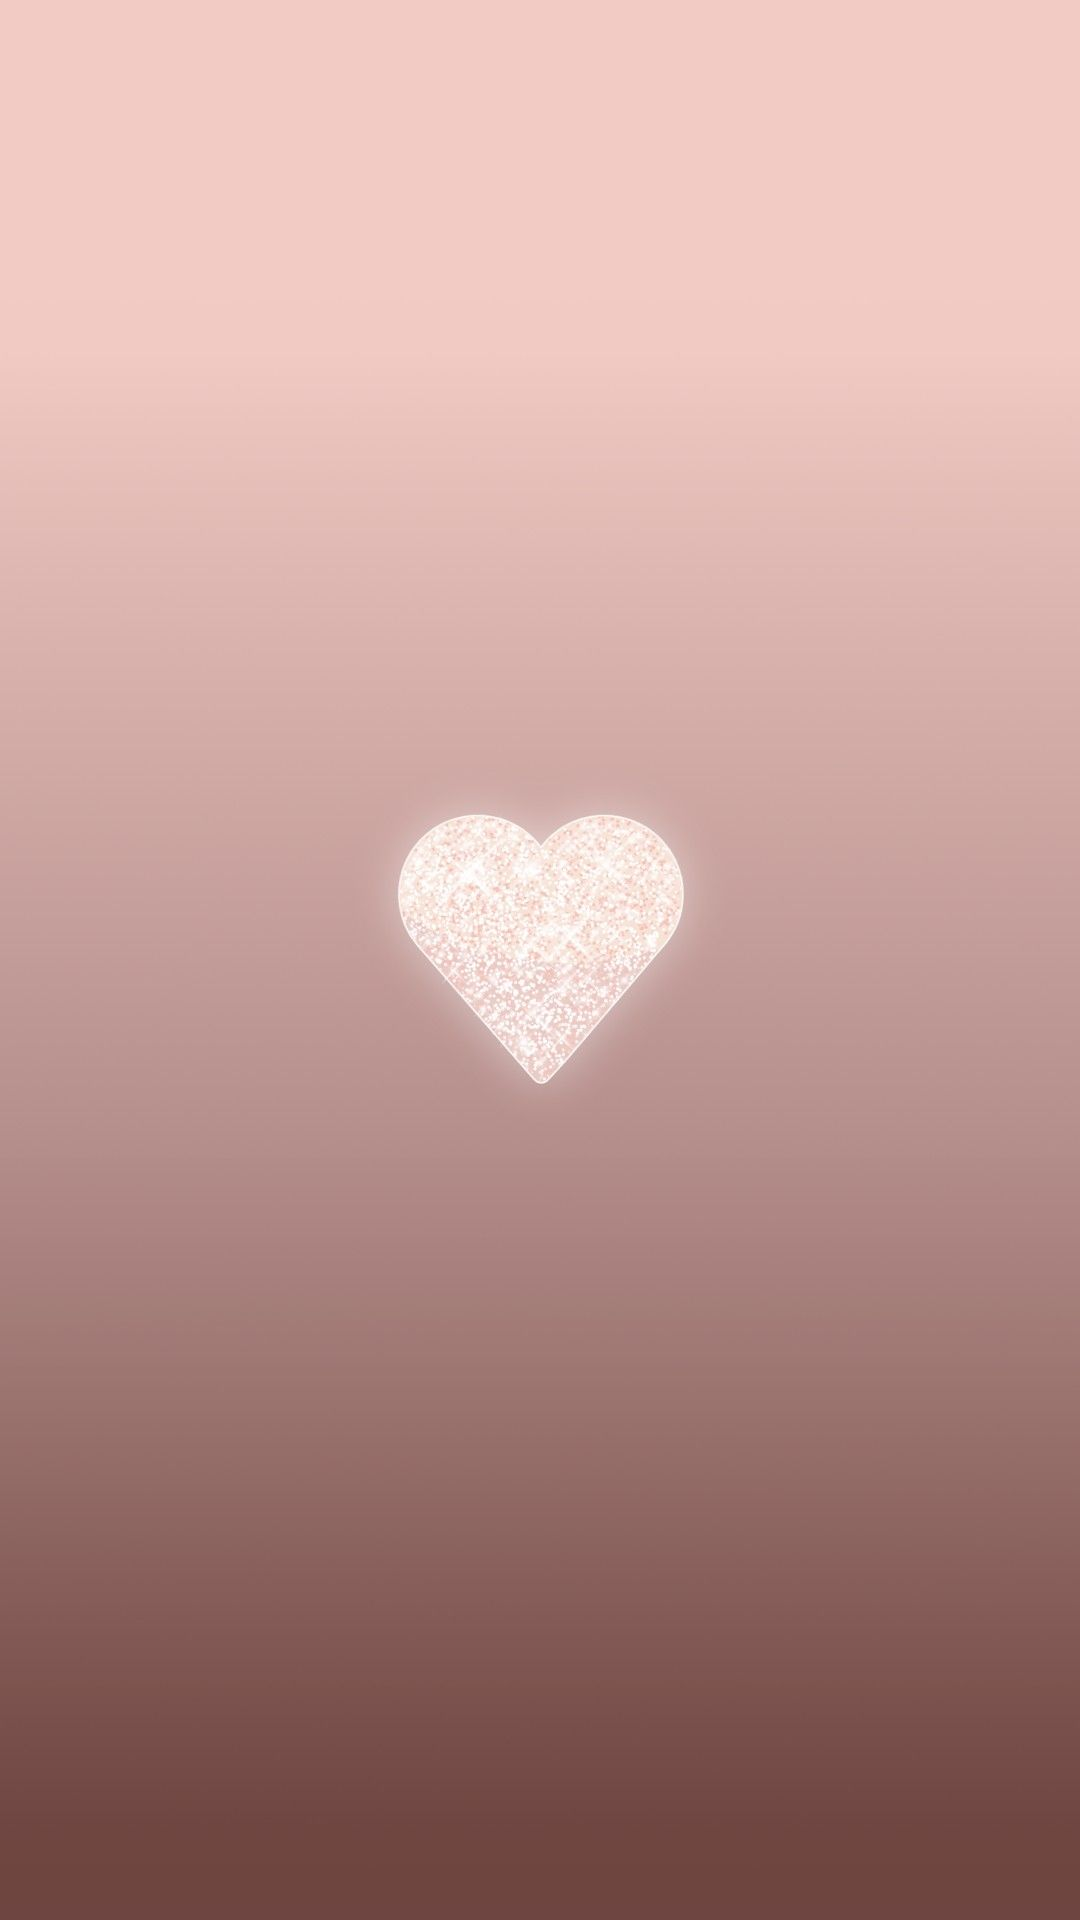 Rose Gold Iphone 7 Cute Wallpaper